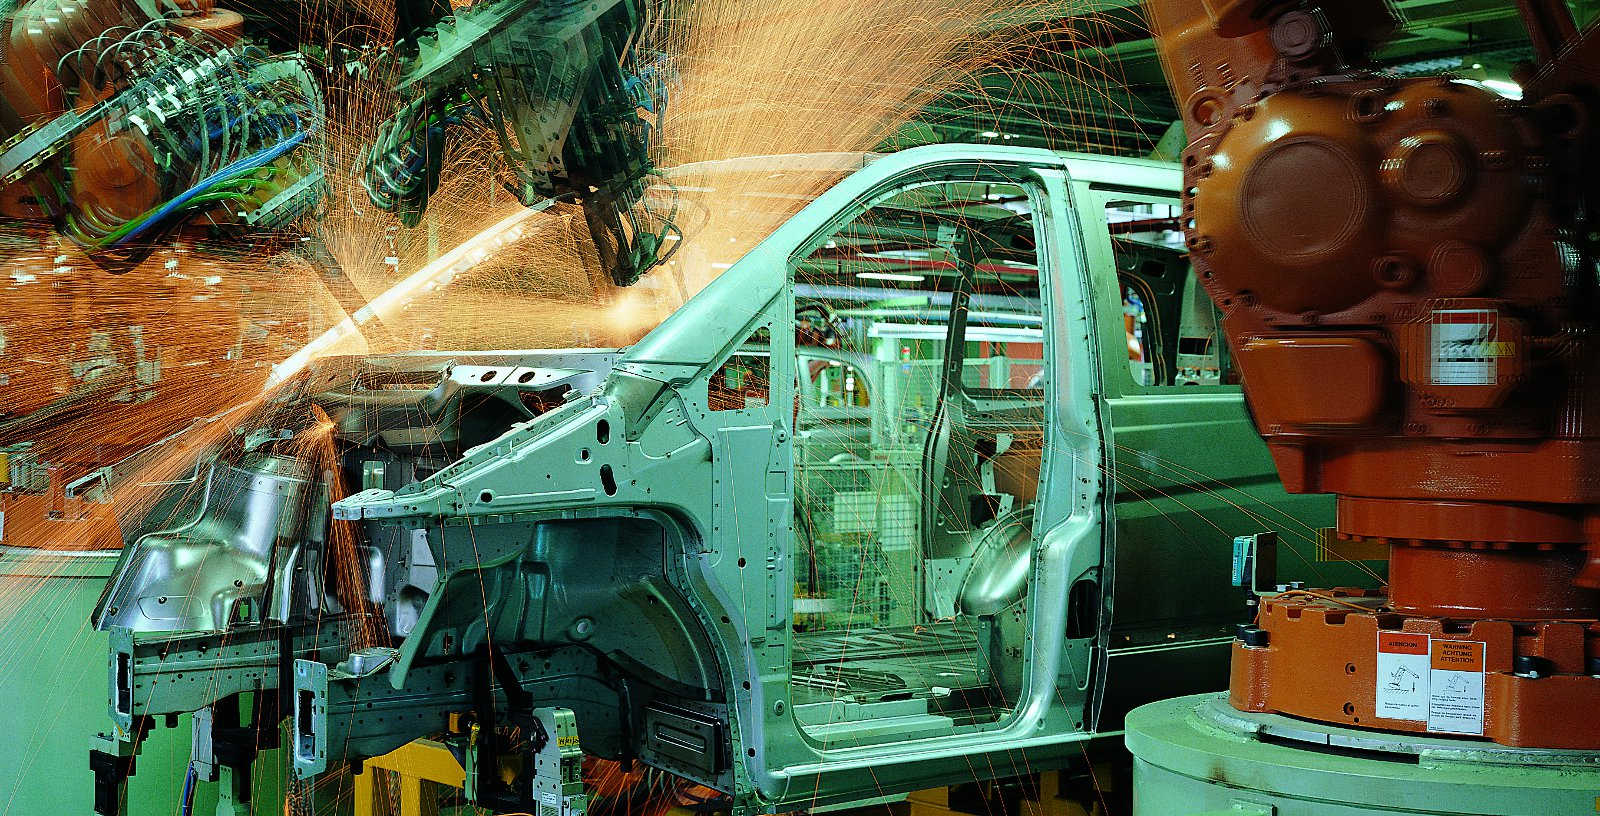 MERCEDES_BENZ_EPCM_Automobile_manufacturing_plantas_05_Idom